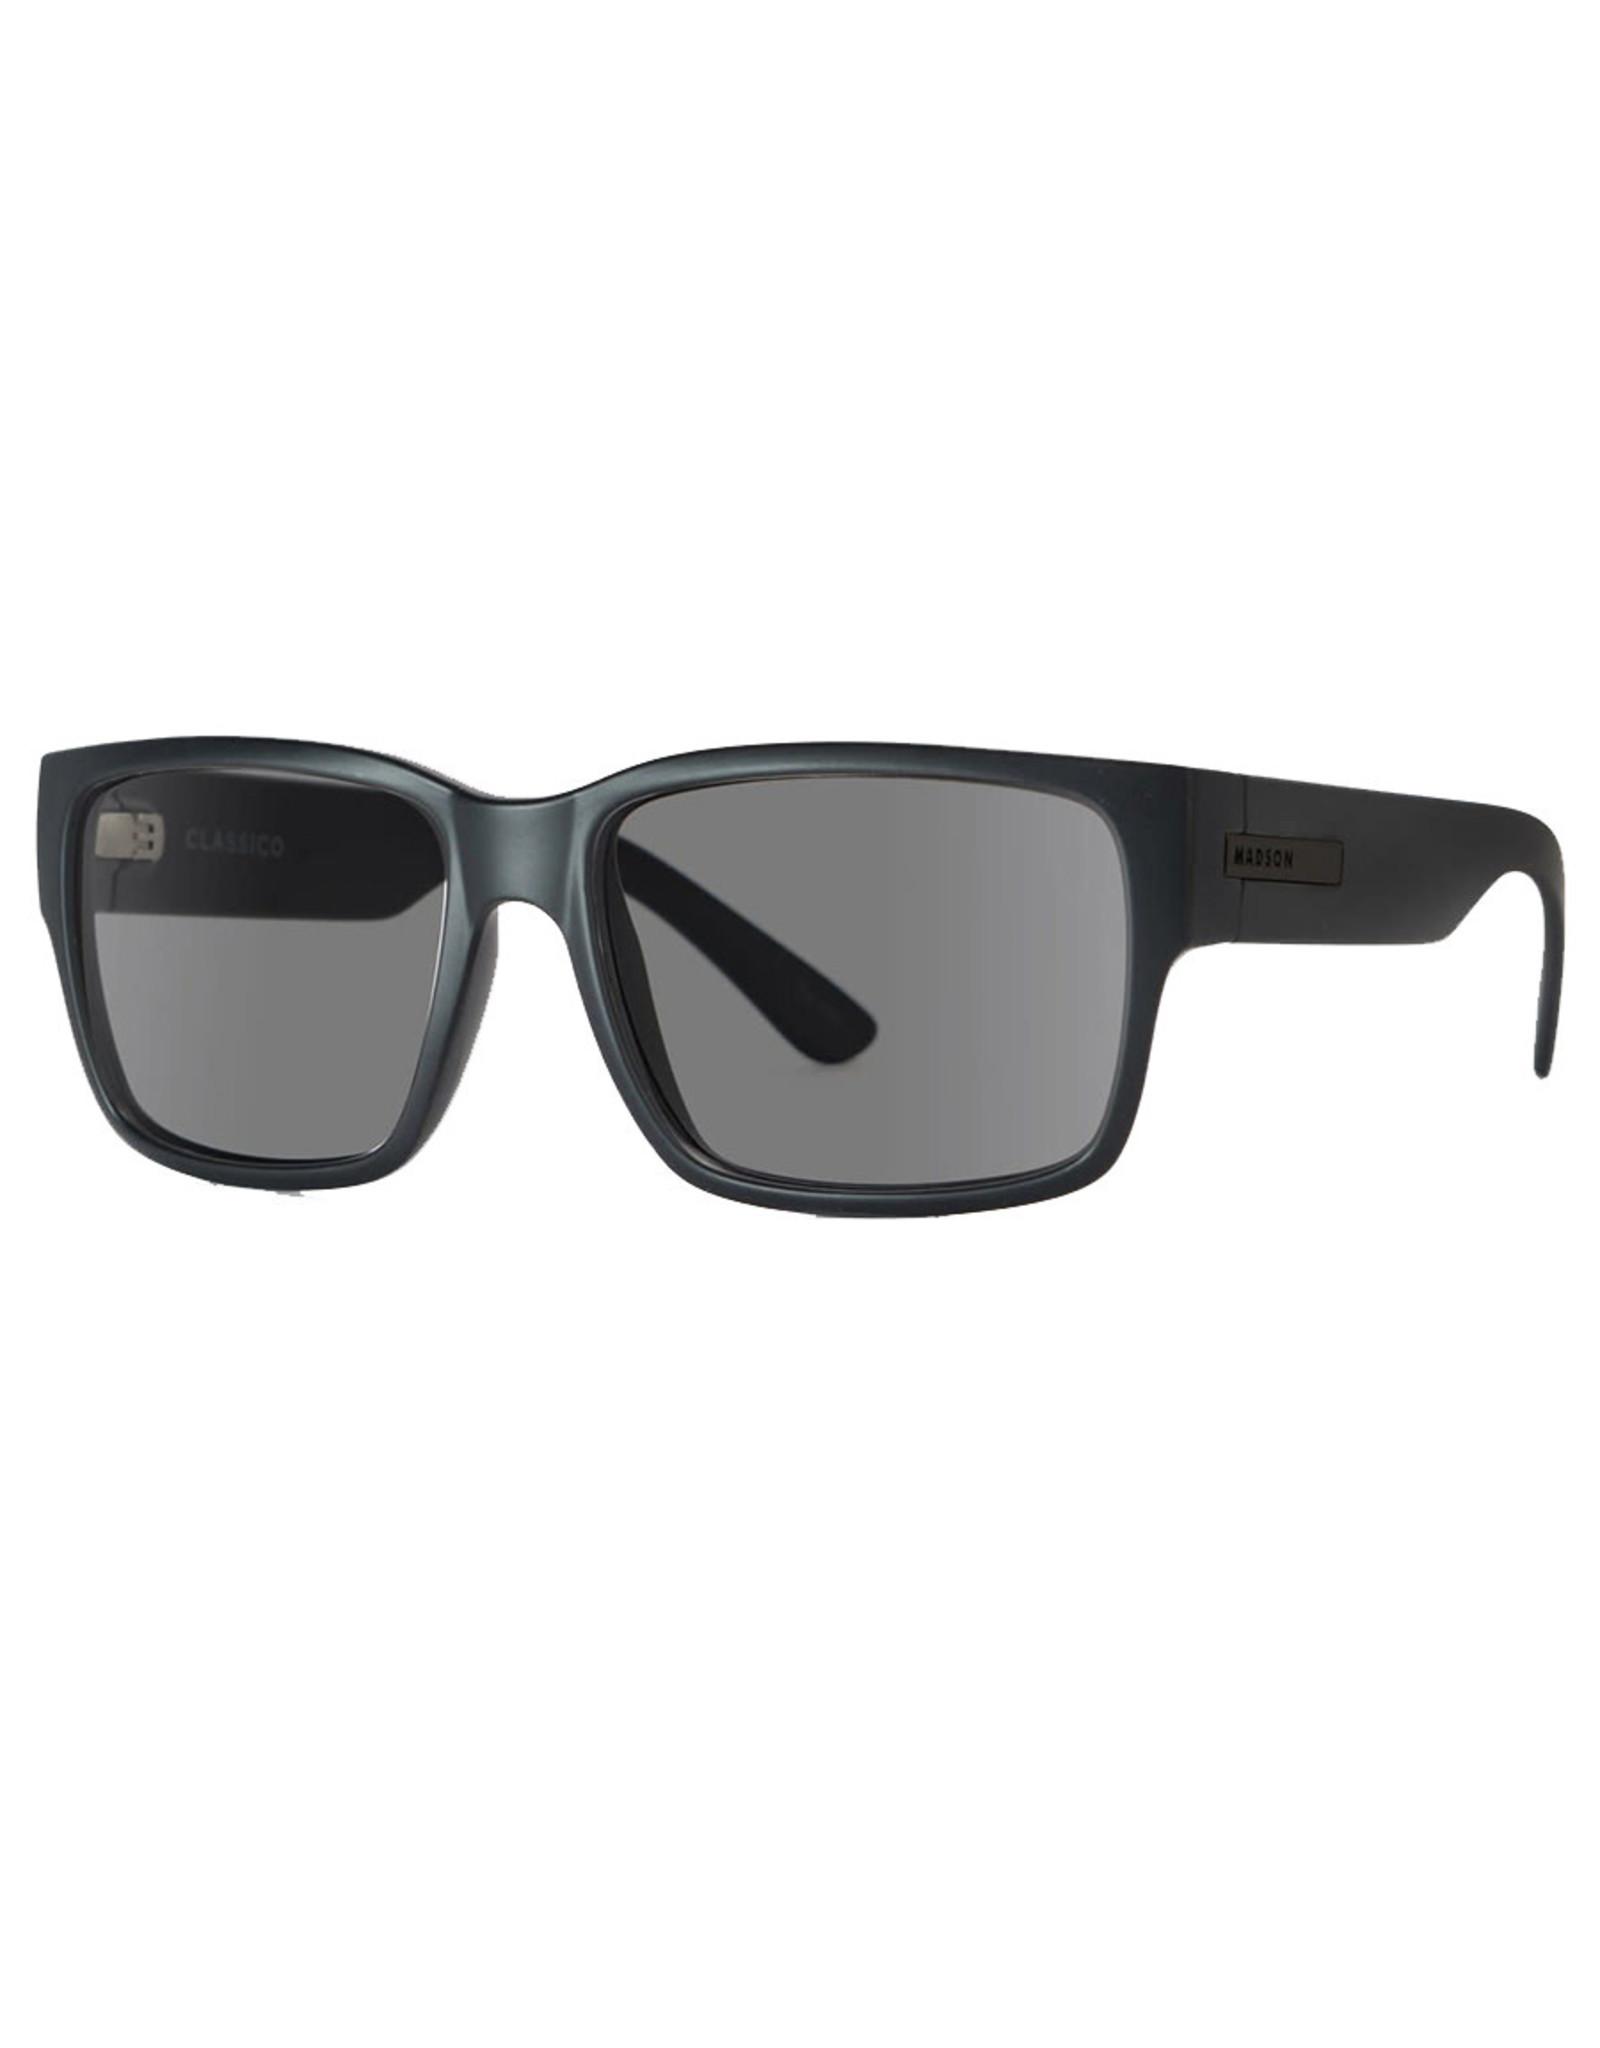 Madson Madson Sunglasses Classico (Black On Black/Grey Polarized Lens)